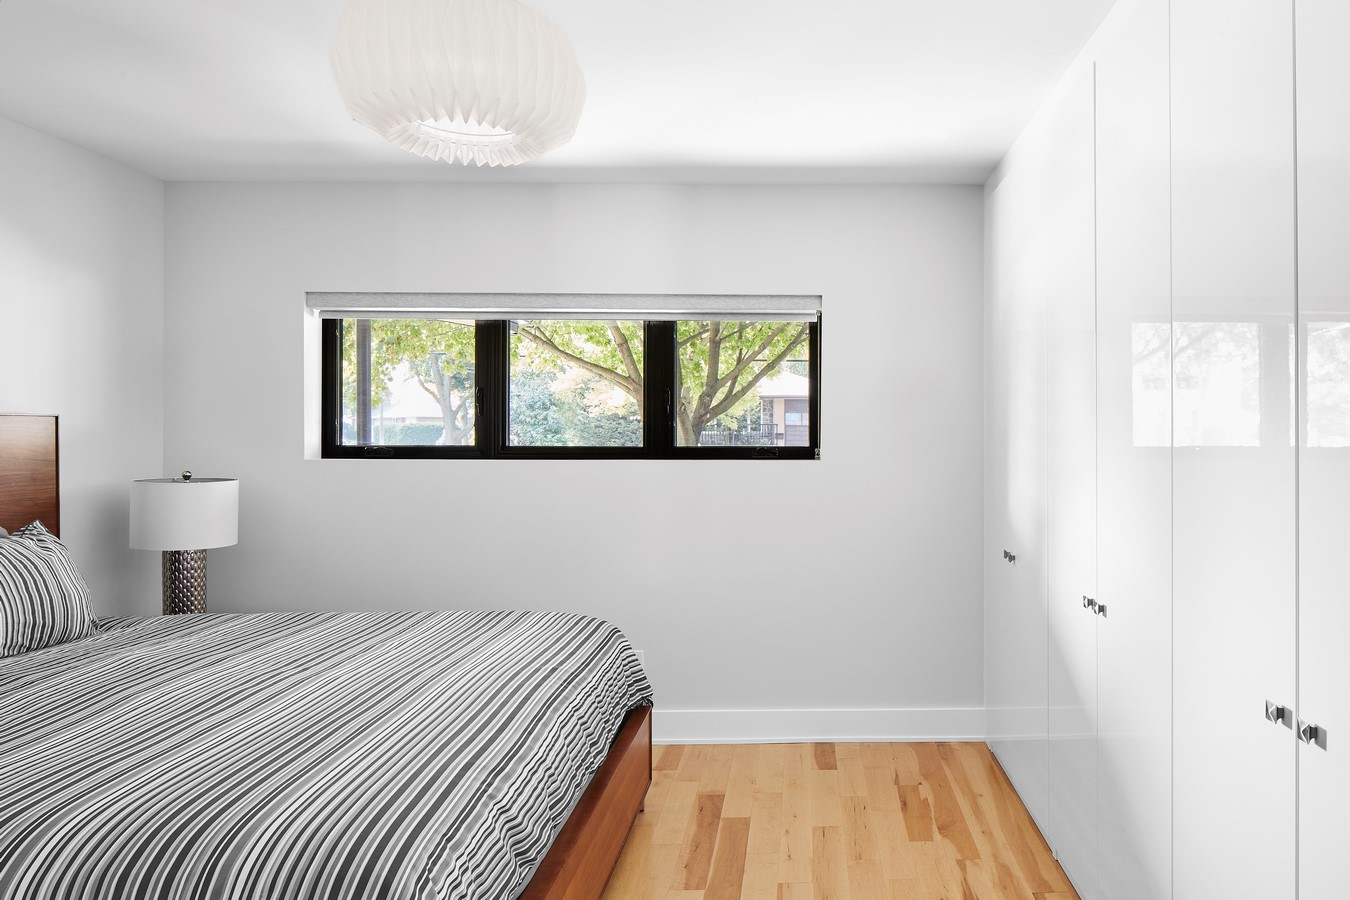 5059 Etobicoke Mid-Century Modern House by Solares Architecture : Sheet 2